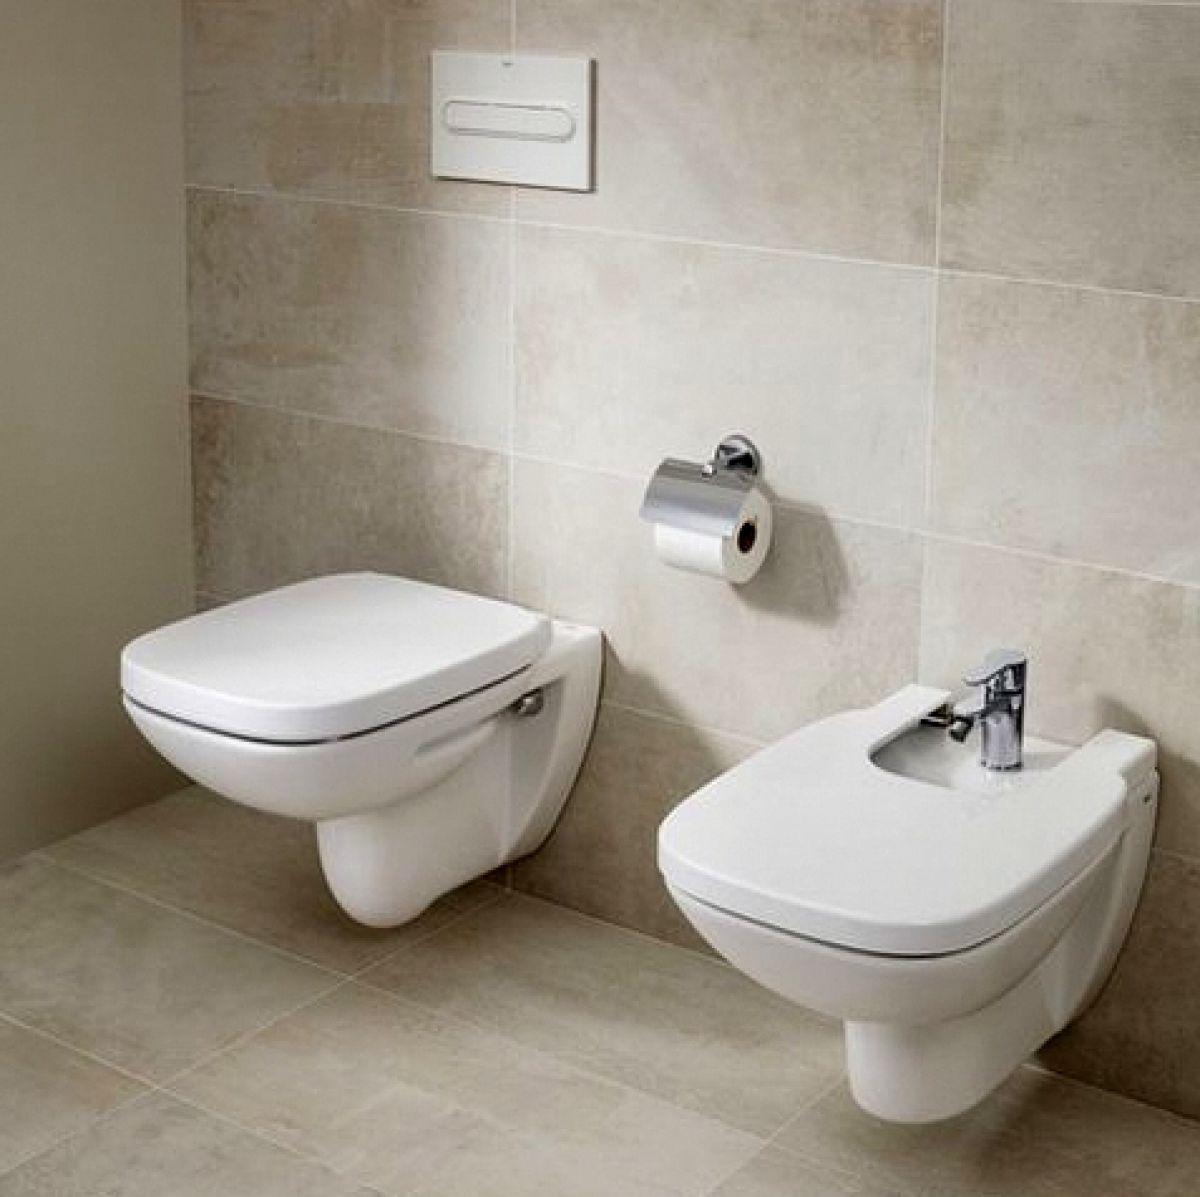 Roca debba wall hung bidet uk bathrooms for Roca bathroom fittings